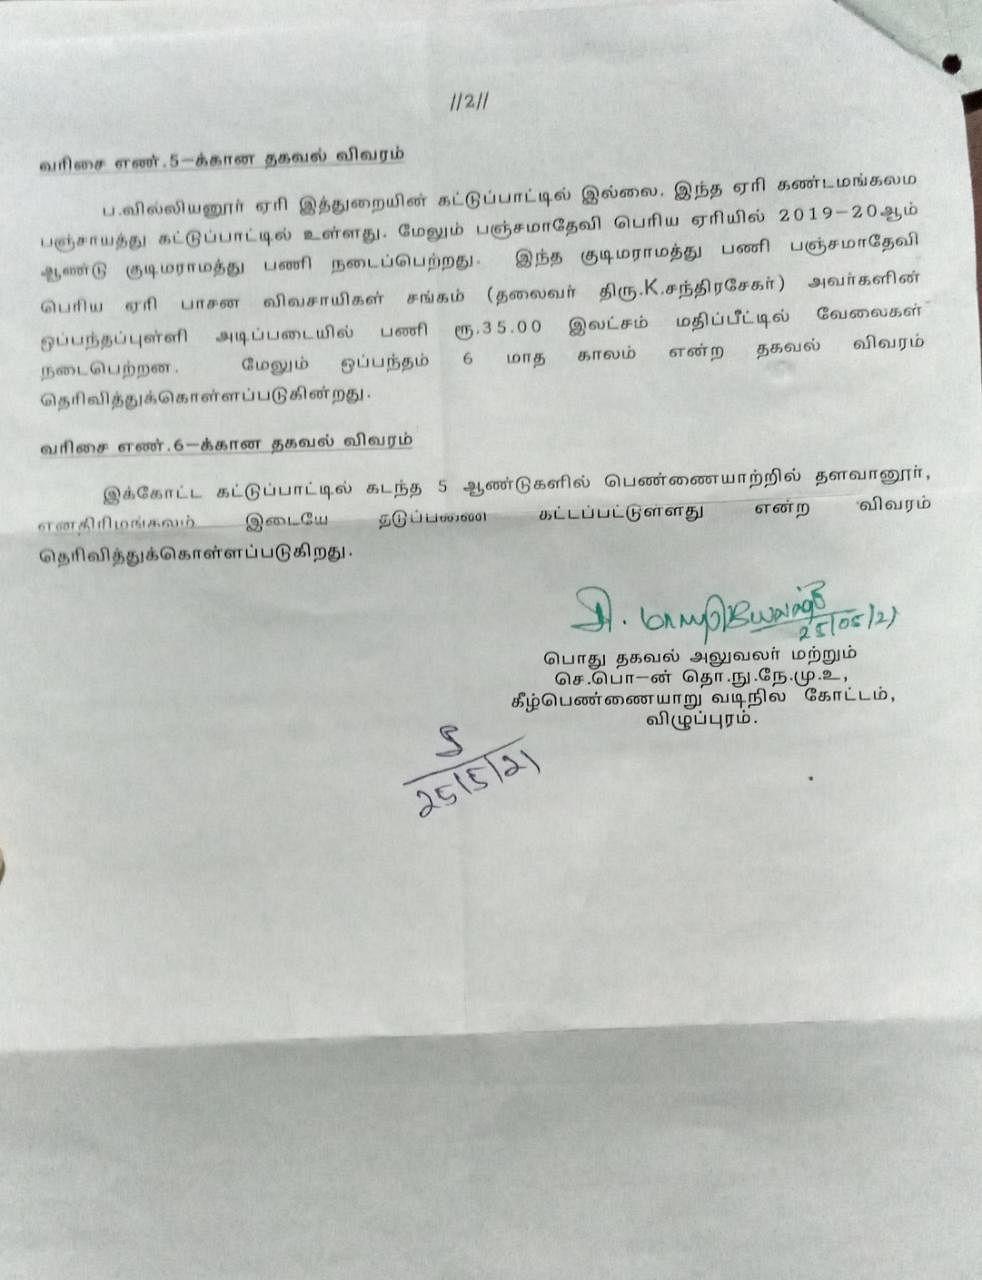 RTI தகவல்